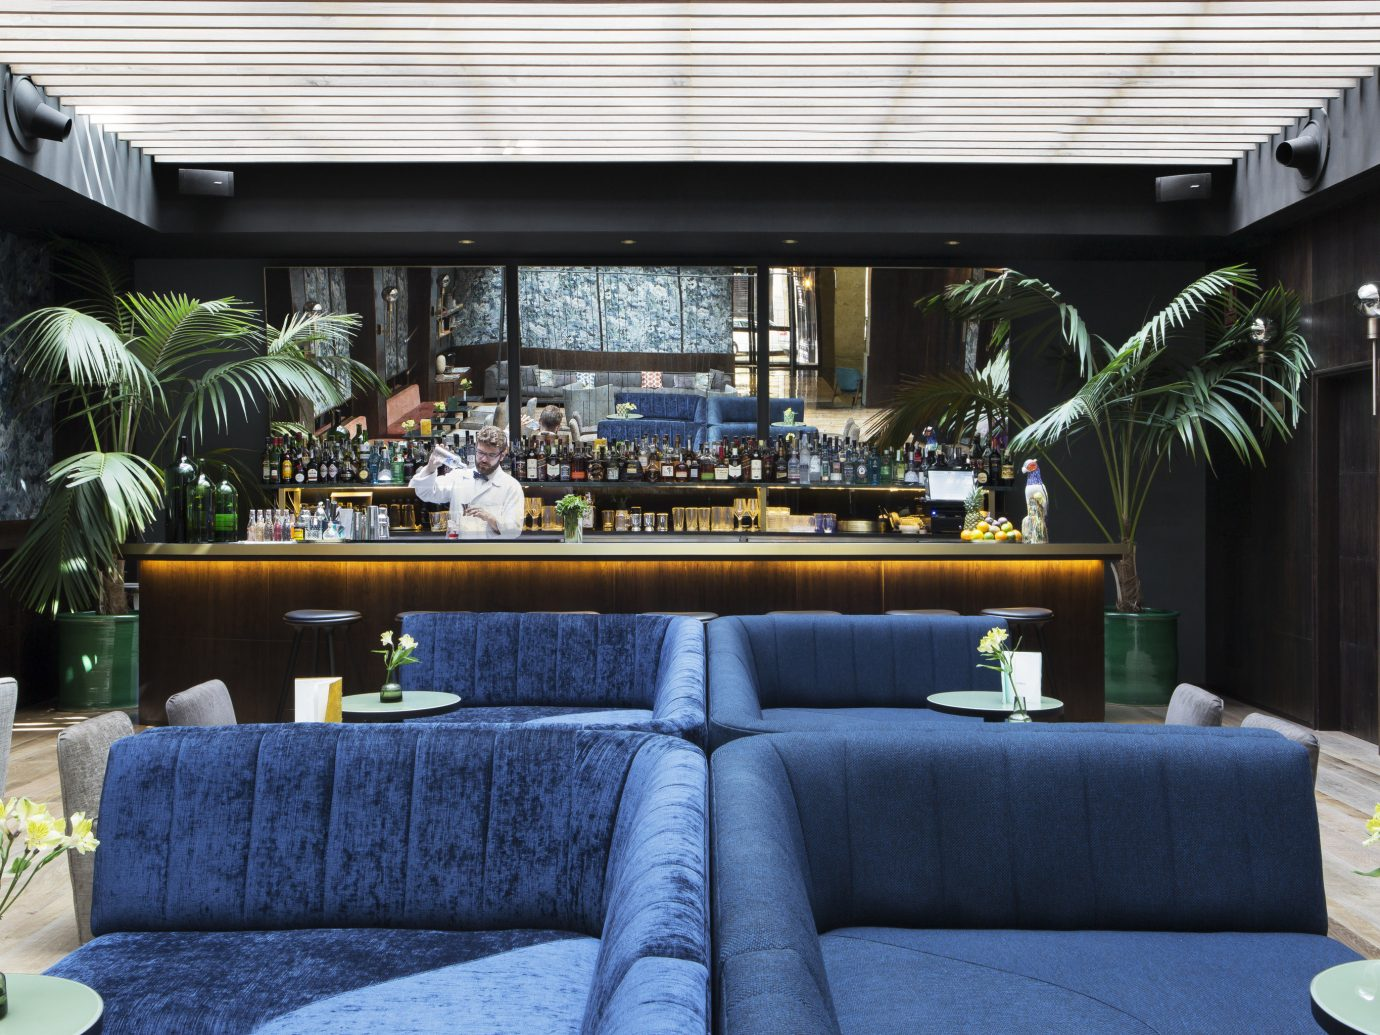 Hotels Madrid Spain window Living indoor Lobby room living room estate home interior design Design restaurant window covering furniture sofa